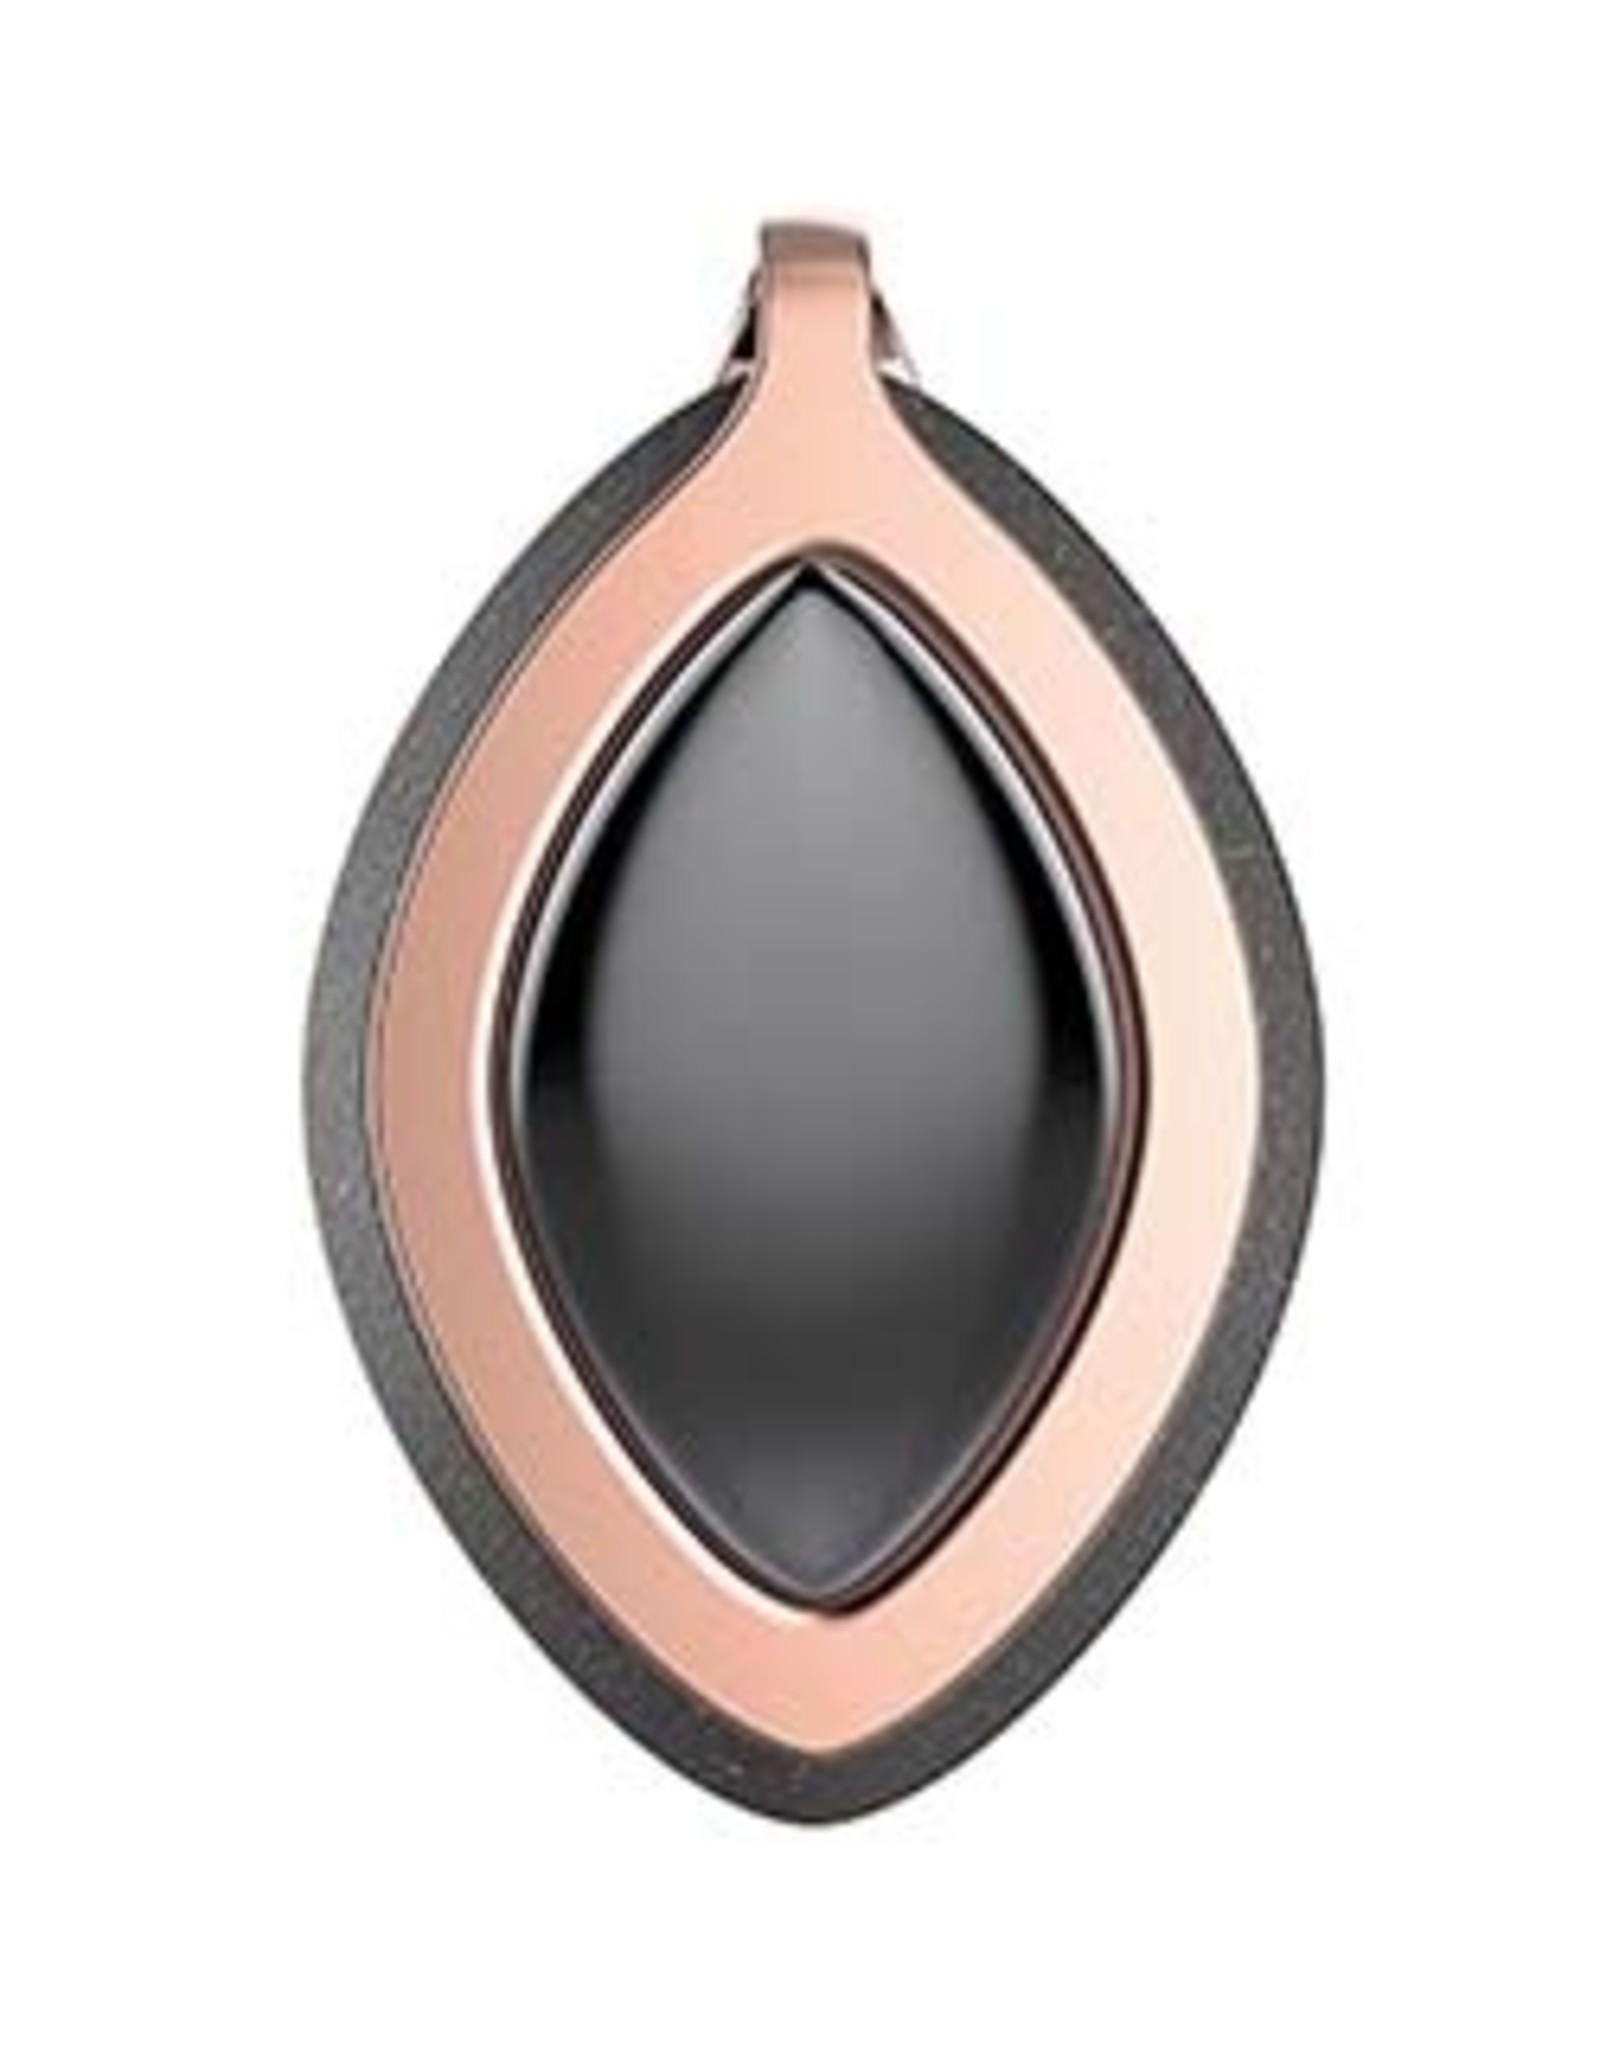 Bellabeat Black/Gold (Power - Onyx) Edition Leaf Chakra Health Tracker/Smart Jewelry 15-04951